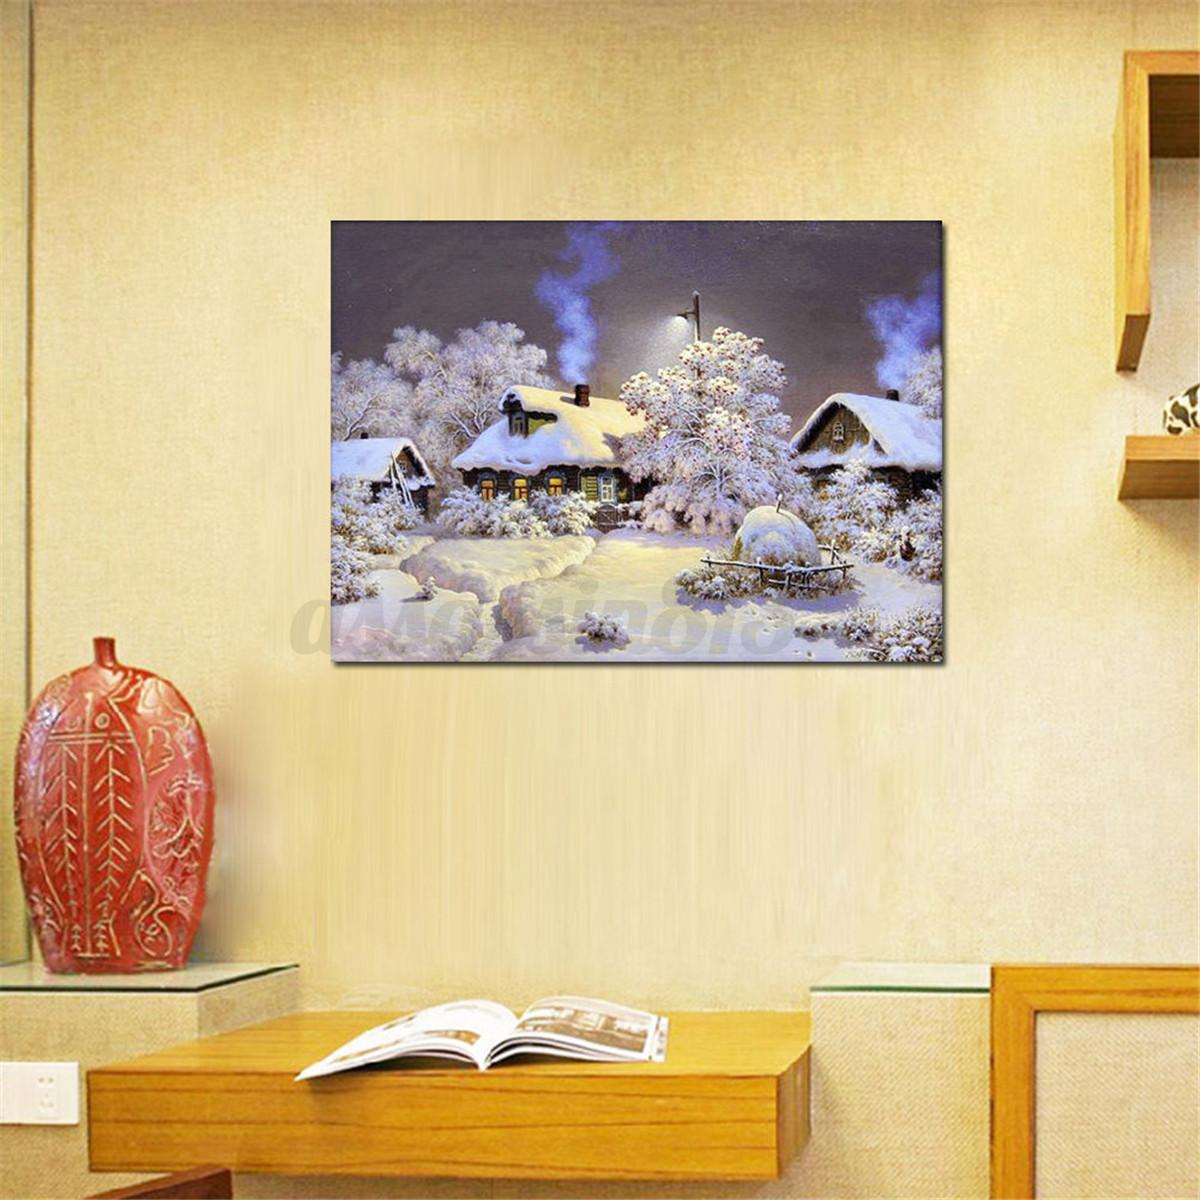 5d diamond tower painting bridge diy craft handmade for Home decor 5d